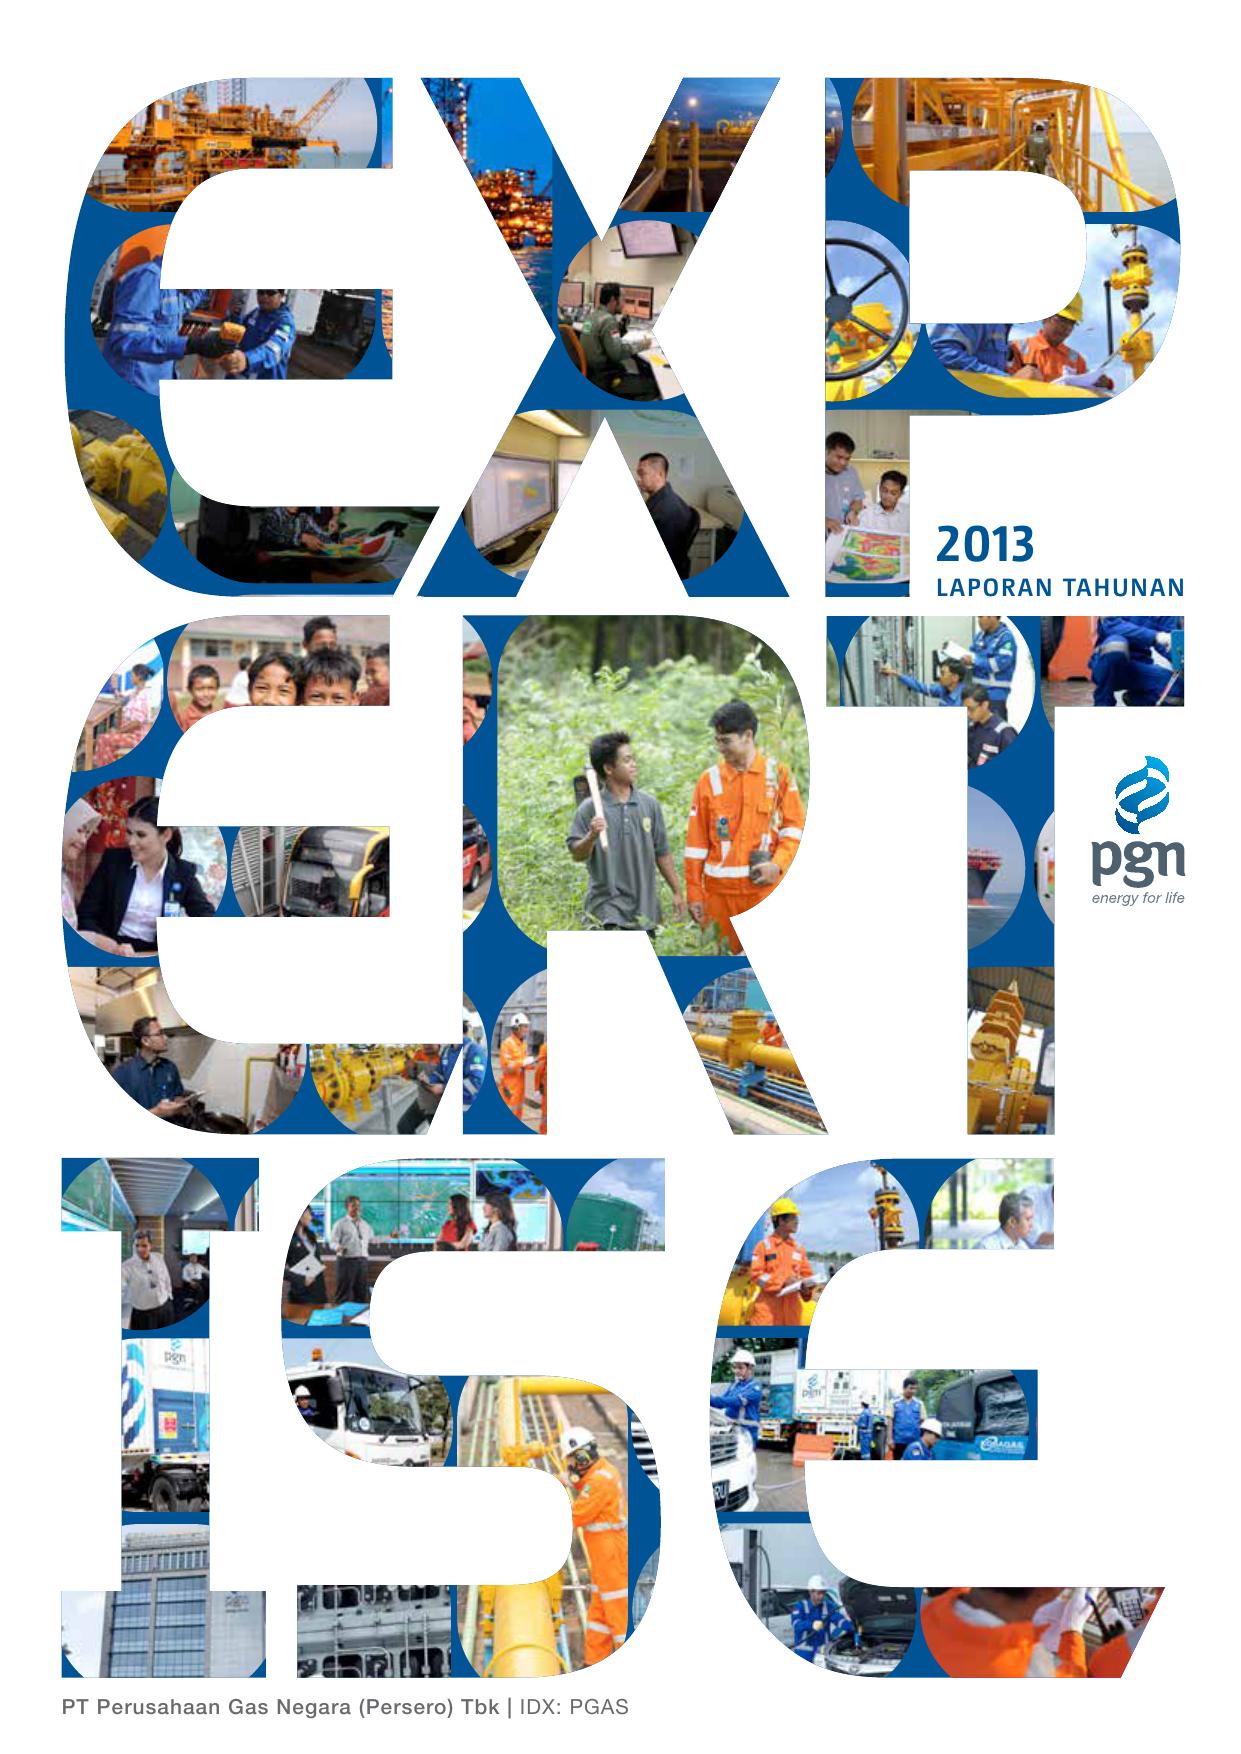 Laporan Tahunan Perusahaan Gas Negara Persero Tbk Pt Produk Ukm Bumn Kain Batik Middle Premium Sutera